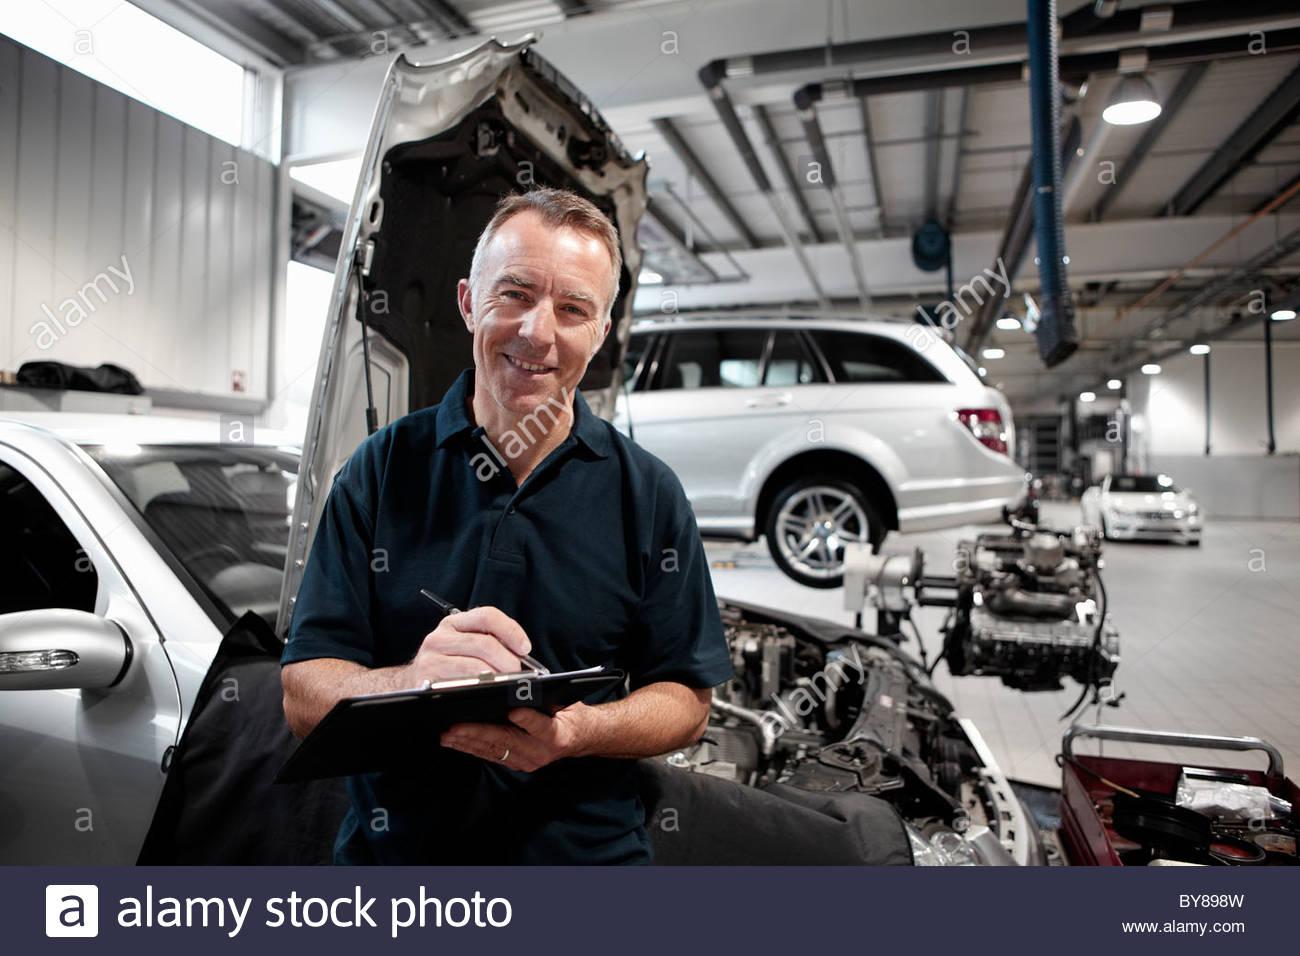 Mechaniker arbeiten in Autowerkstatt Stockbild